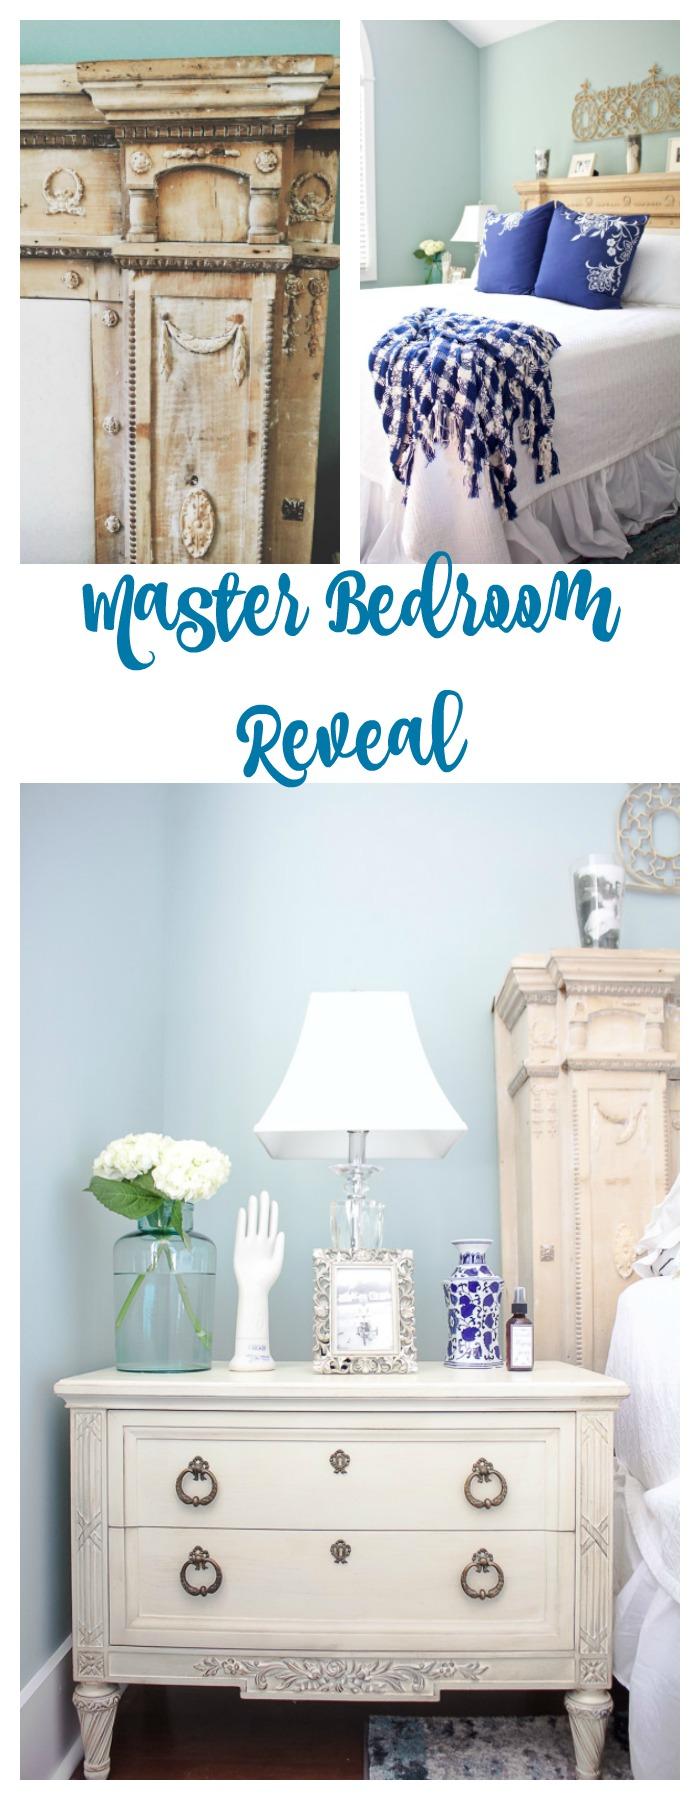 Vintage decor in the master bedroom